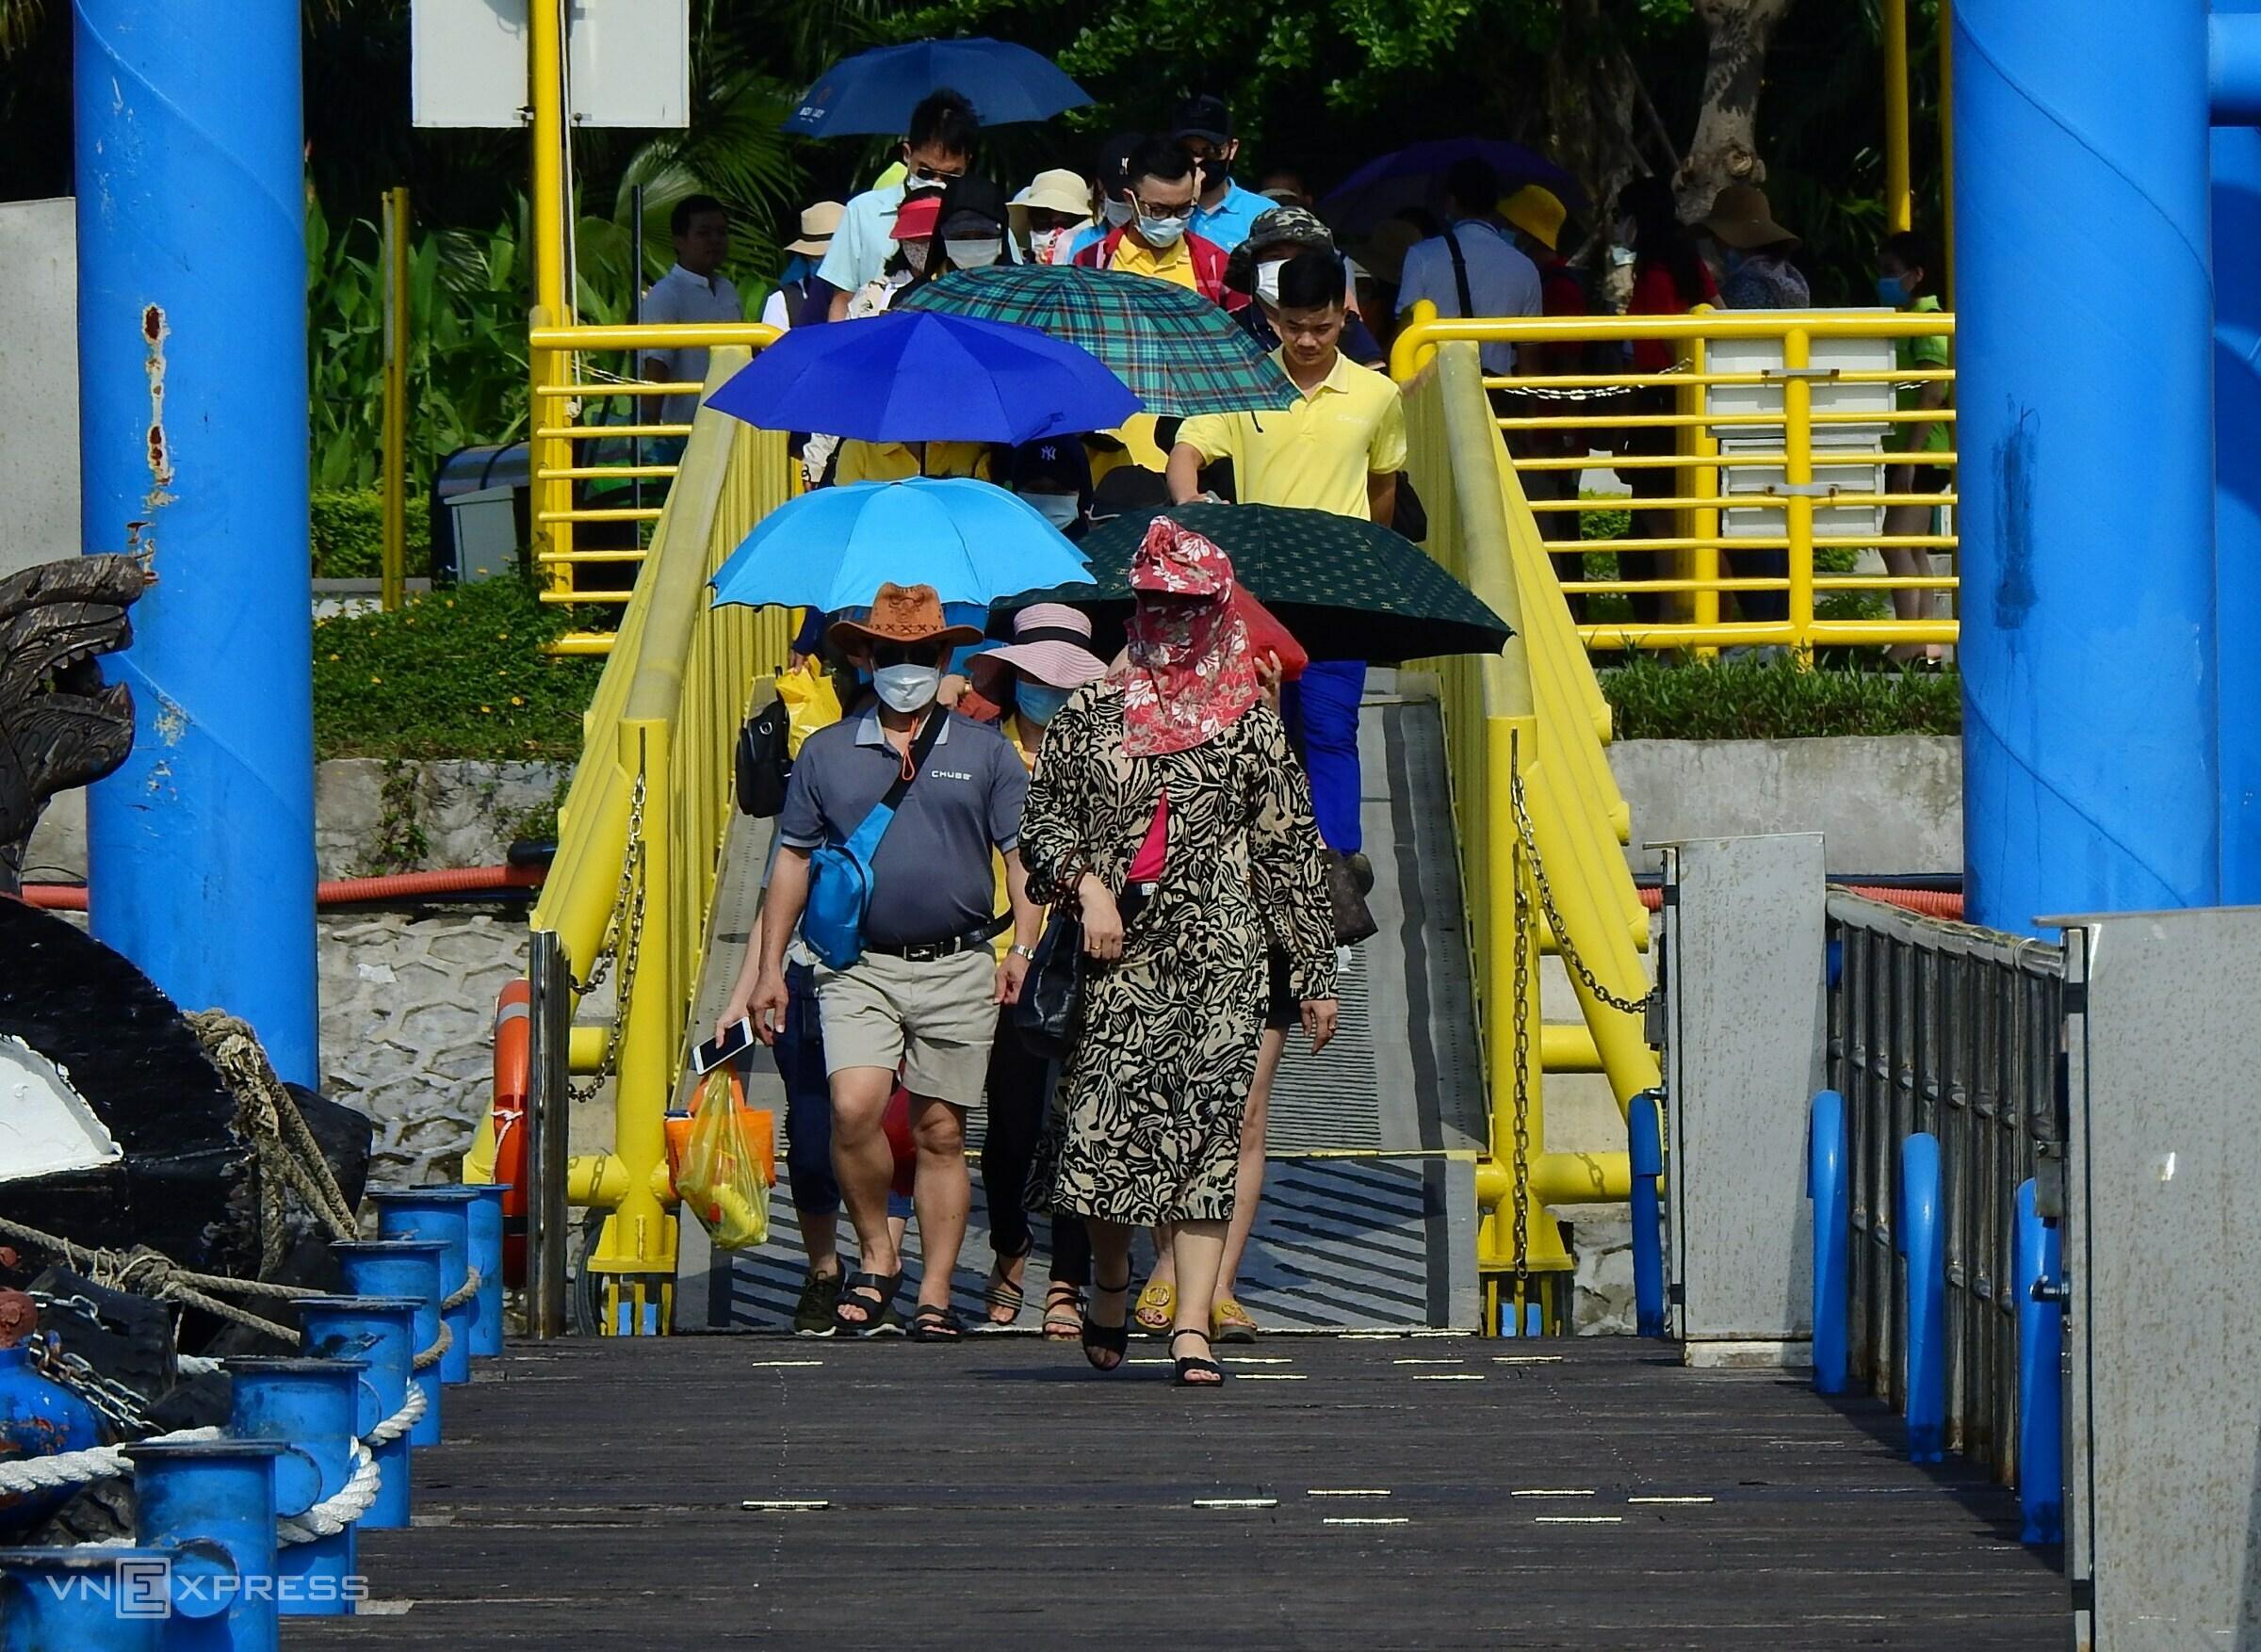 Ha Long Bay bustles after months of frozen tourism